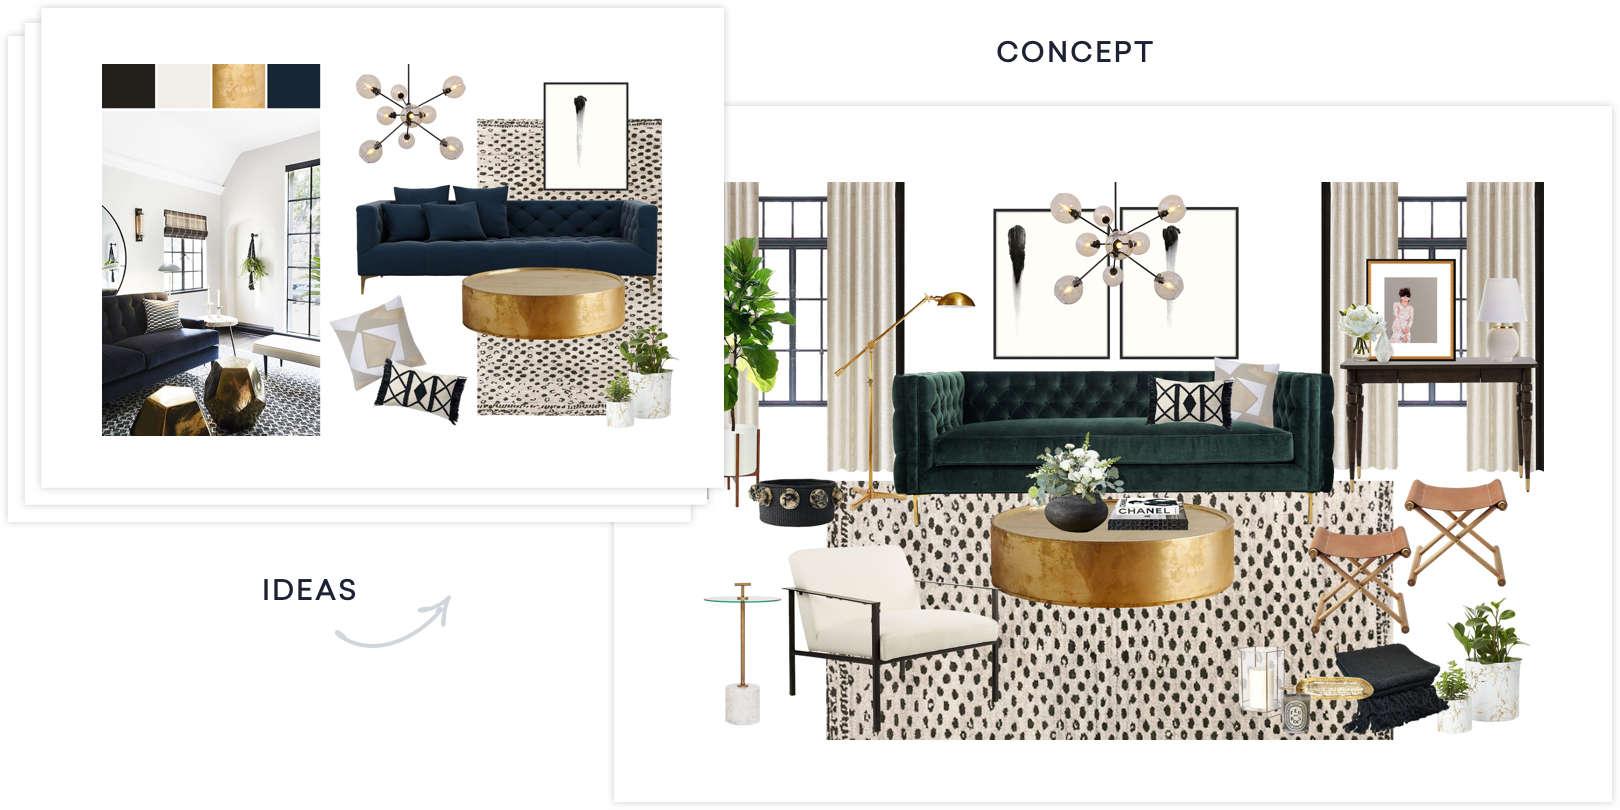 Online Interior Design & Decorating Services Havenly